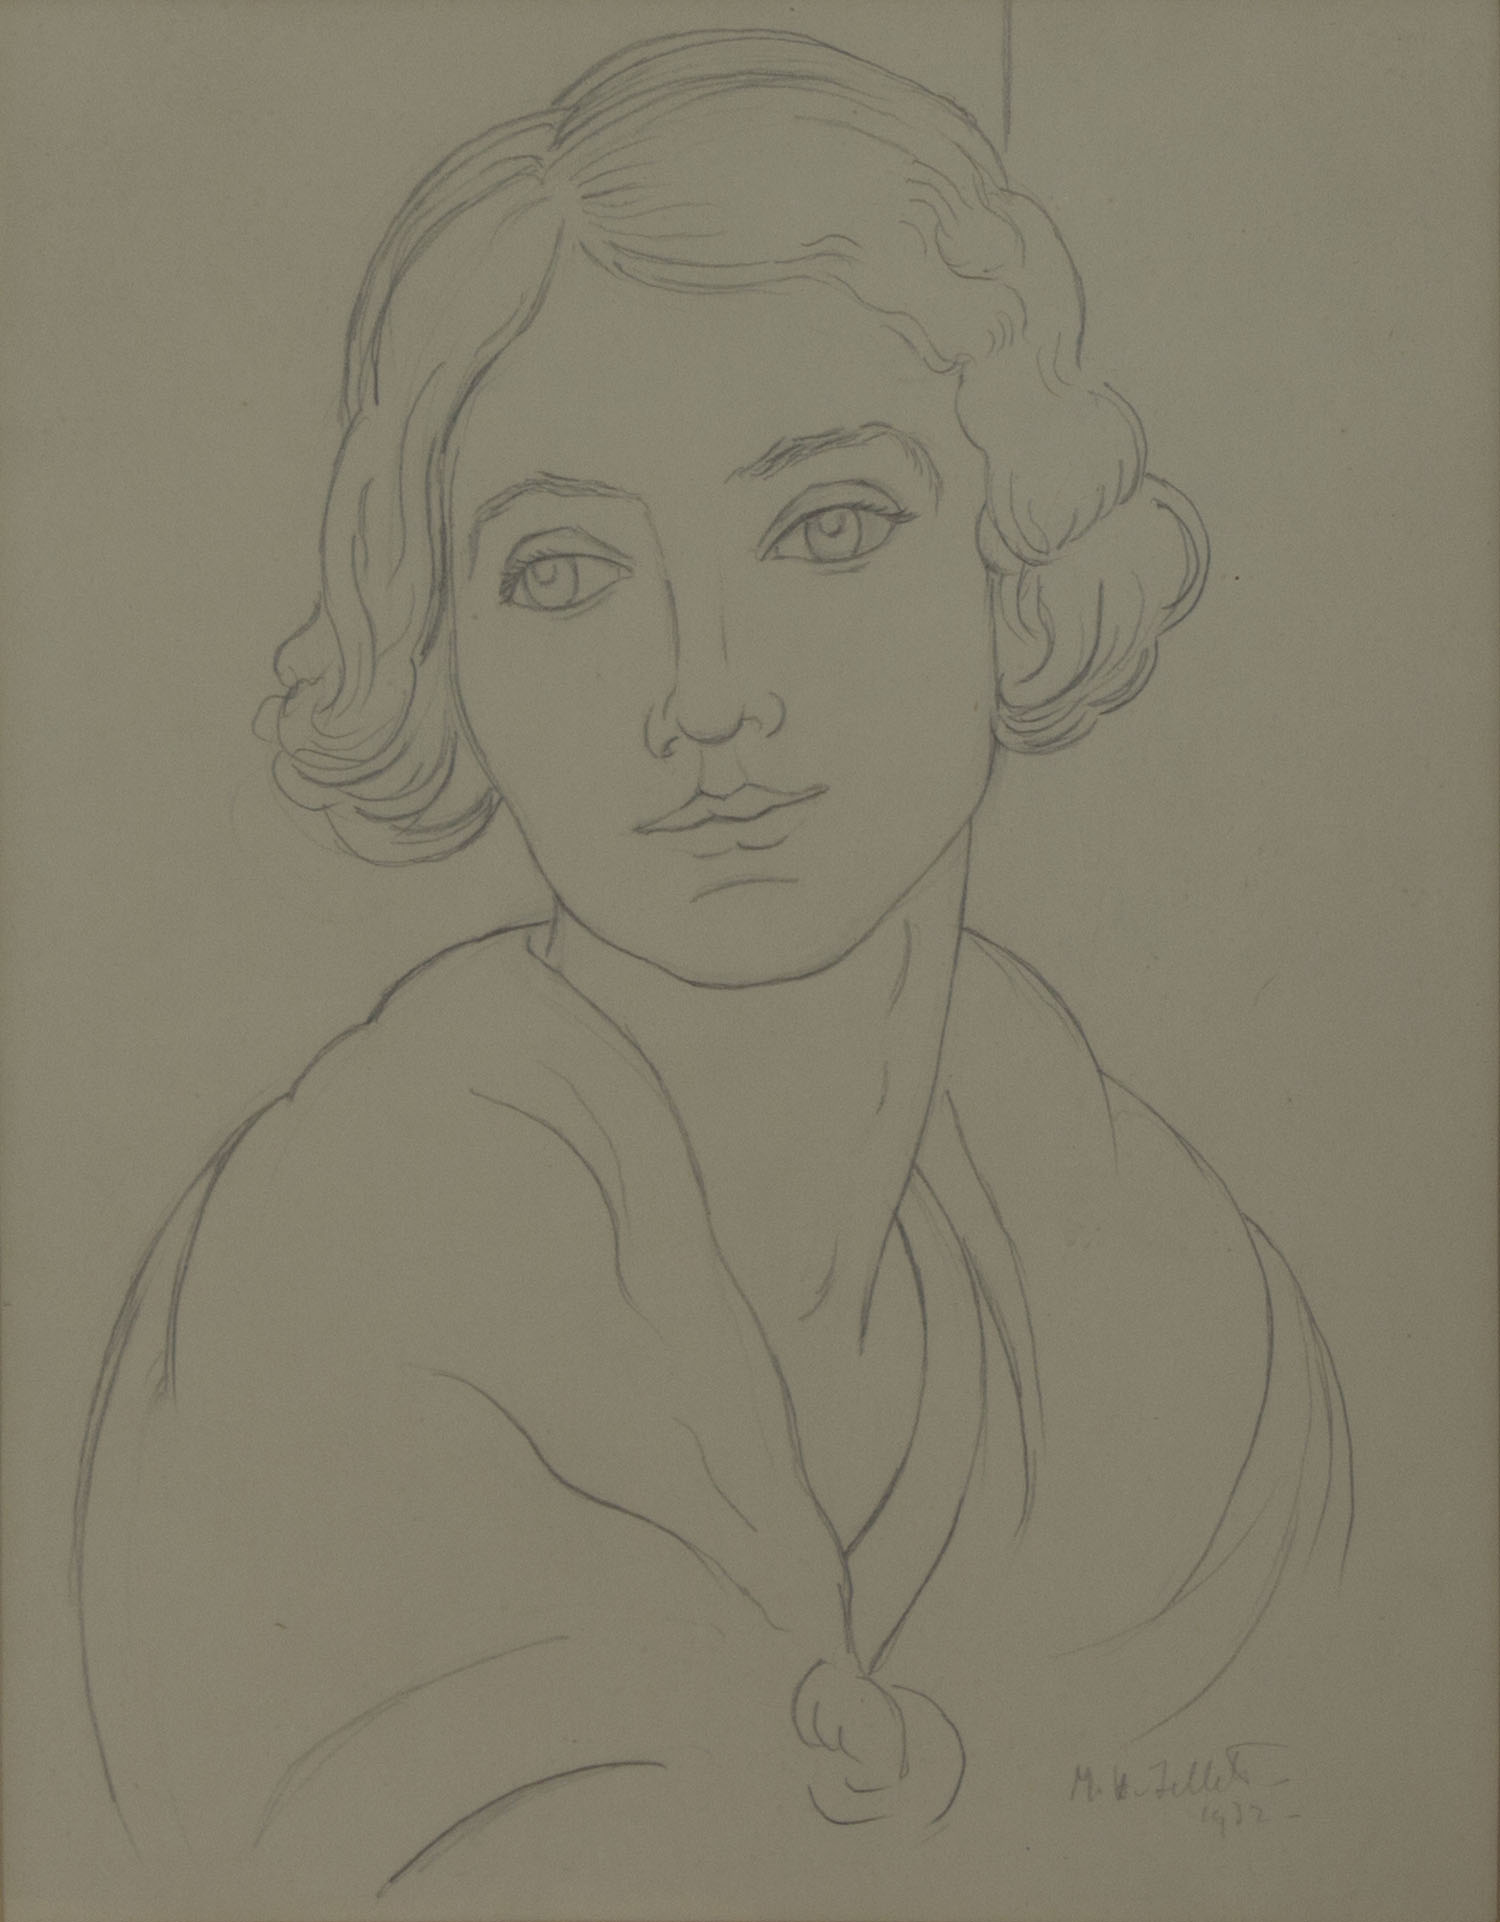 Mainie Jellett 'Head Of A Girl' 1932 pencil drawing on paper 29x23cm.jpg